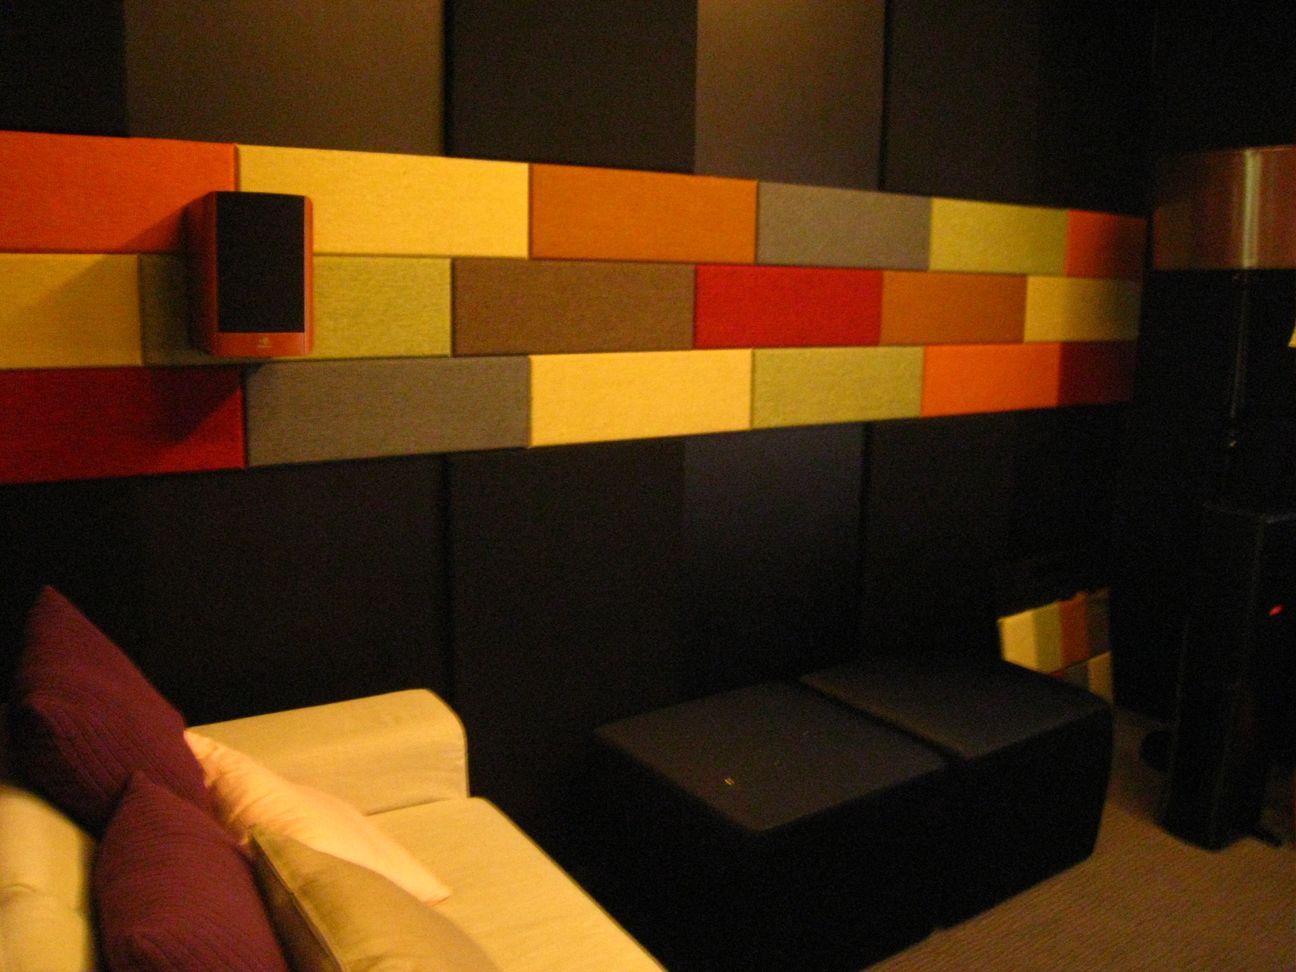 SCG sound absorbing materials installation Zandera Wall Decorative (12)